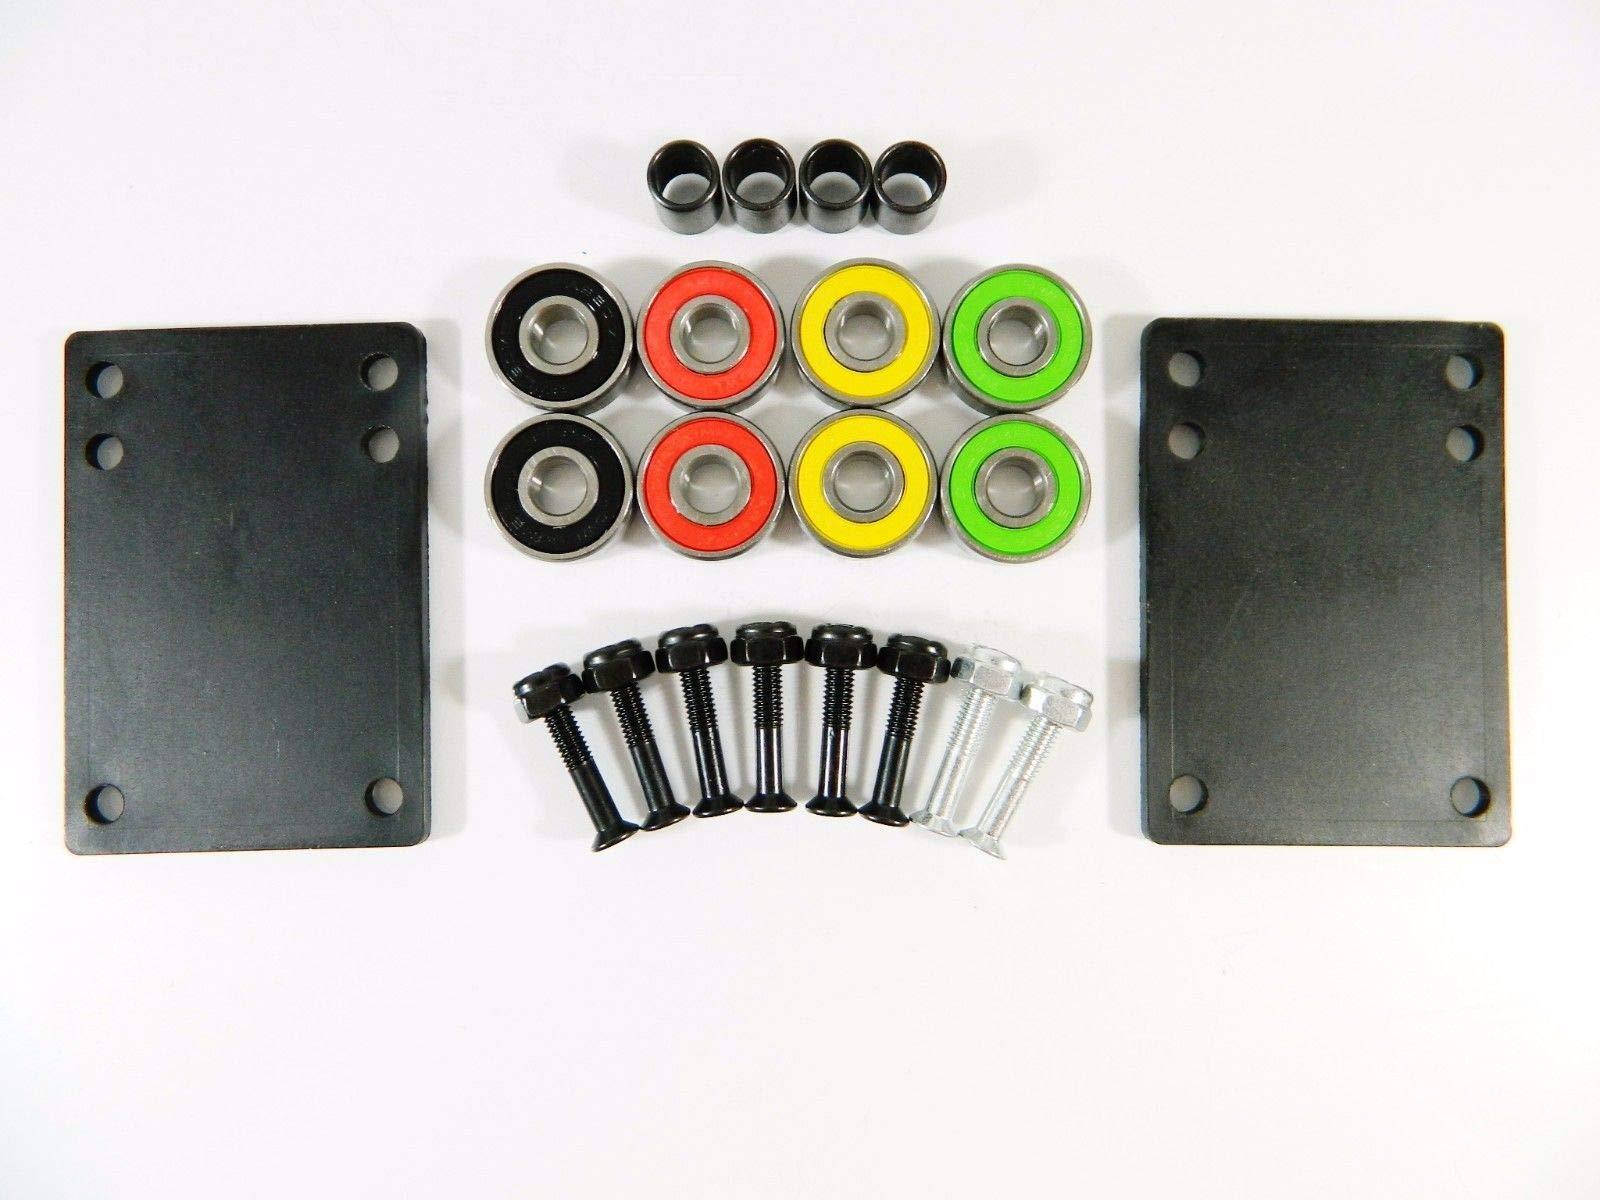 Good Skateboard Rasta ABEC 7 Precision Bearings + 1.0'' Color Hardware + 1/8'' Riser Pads